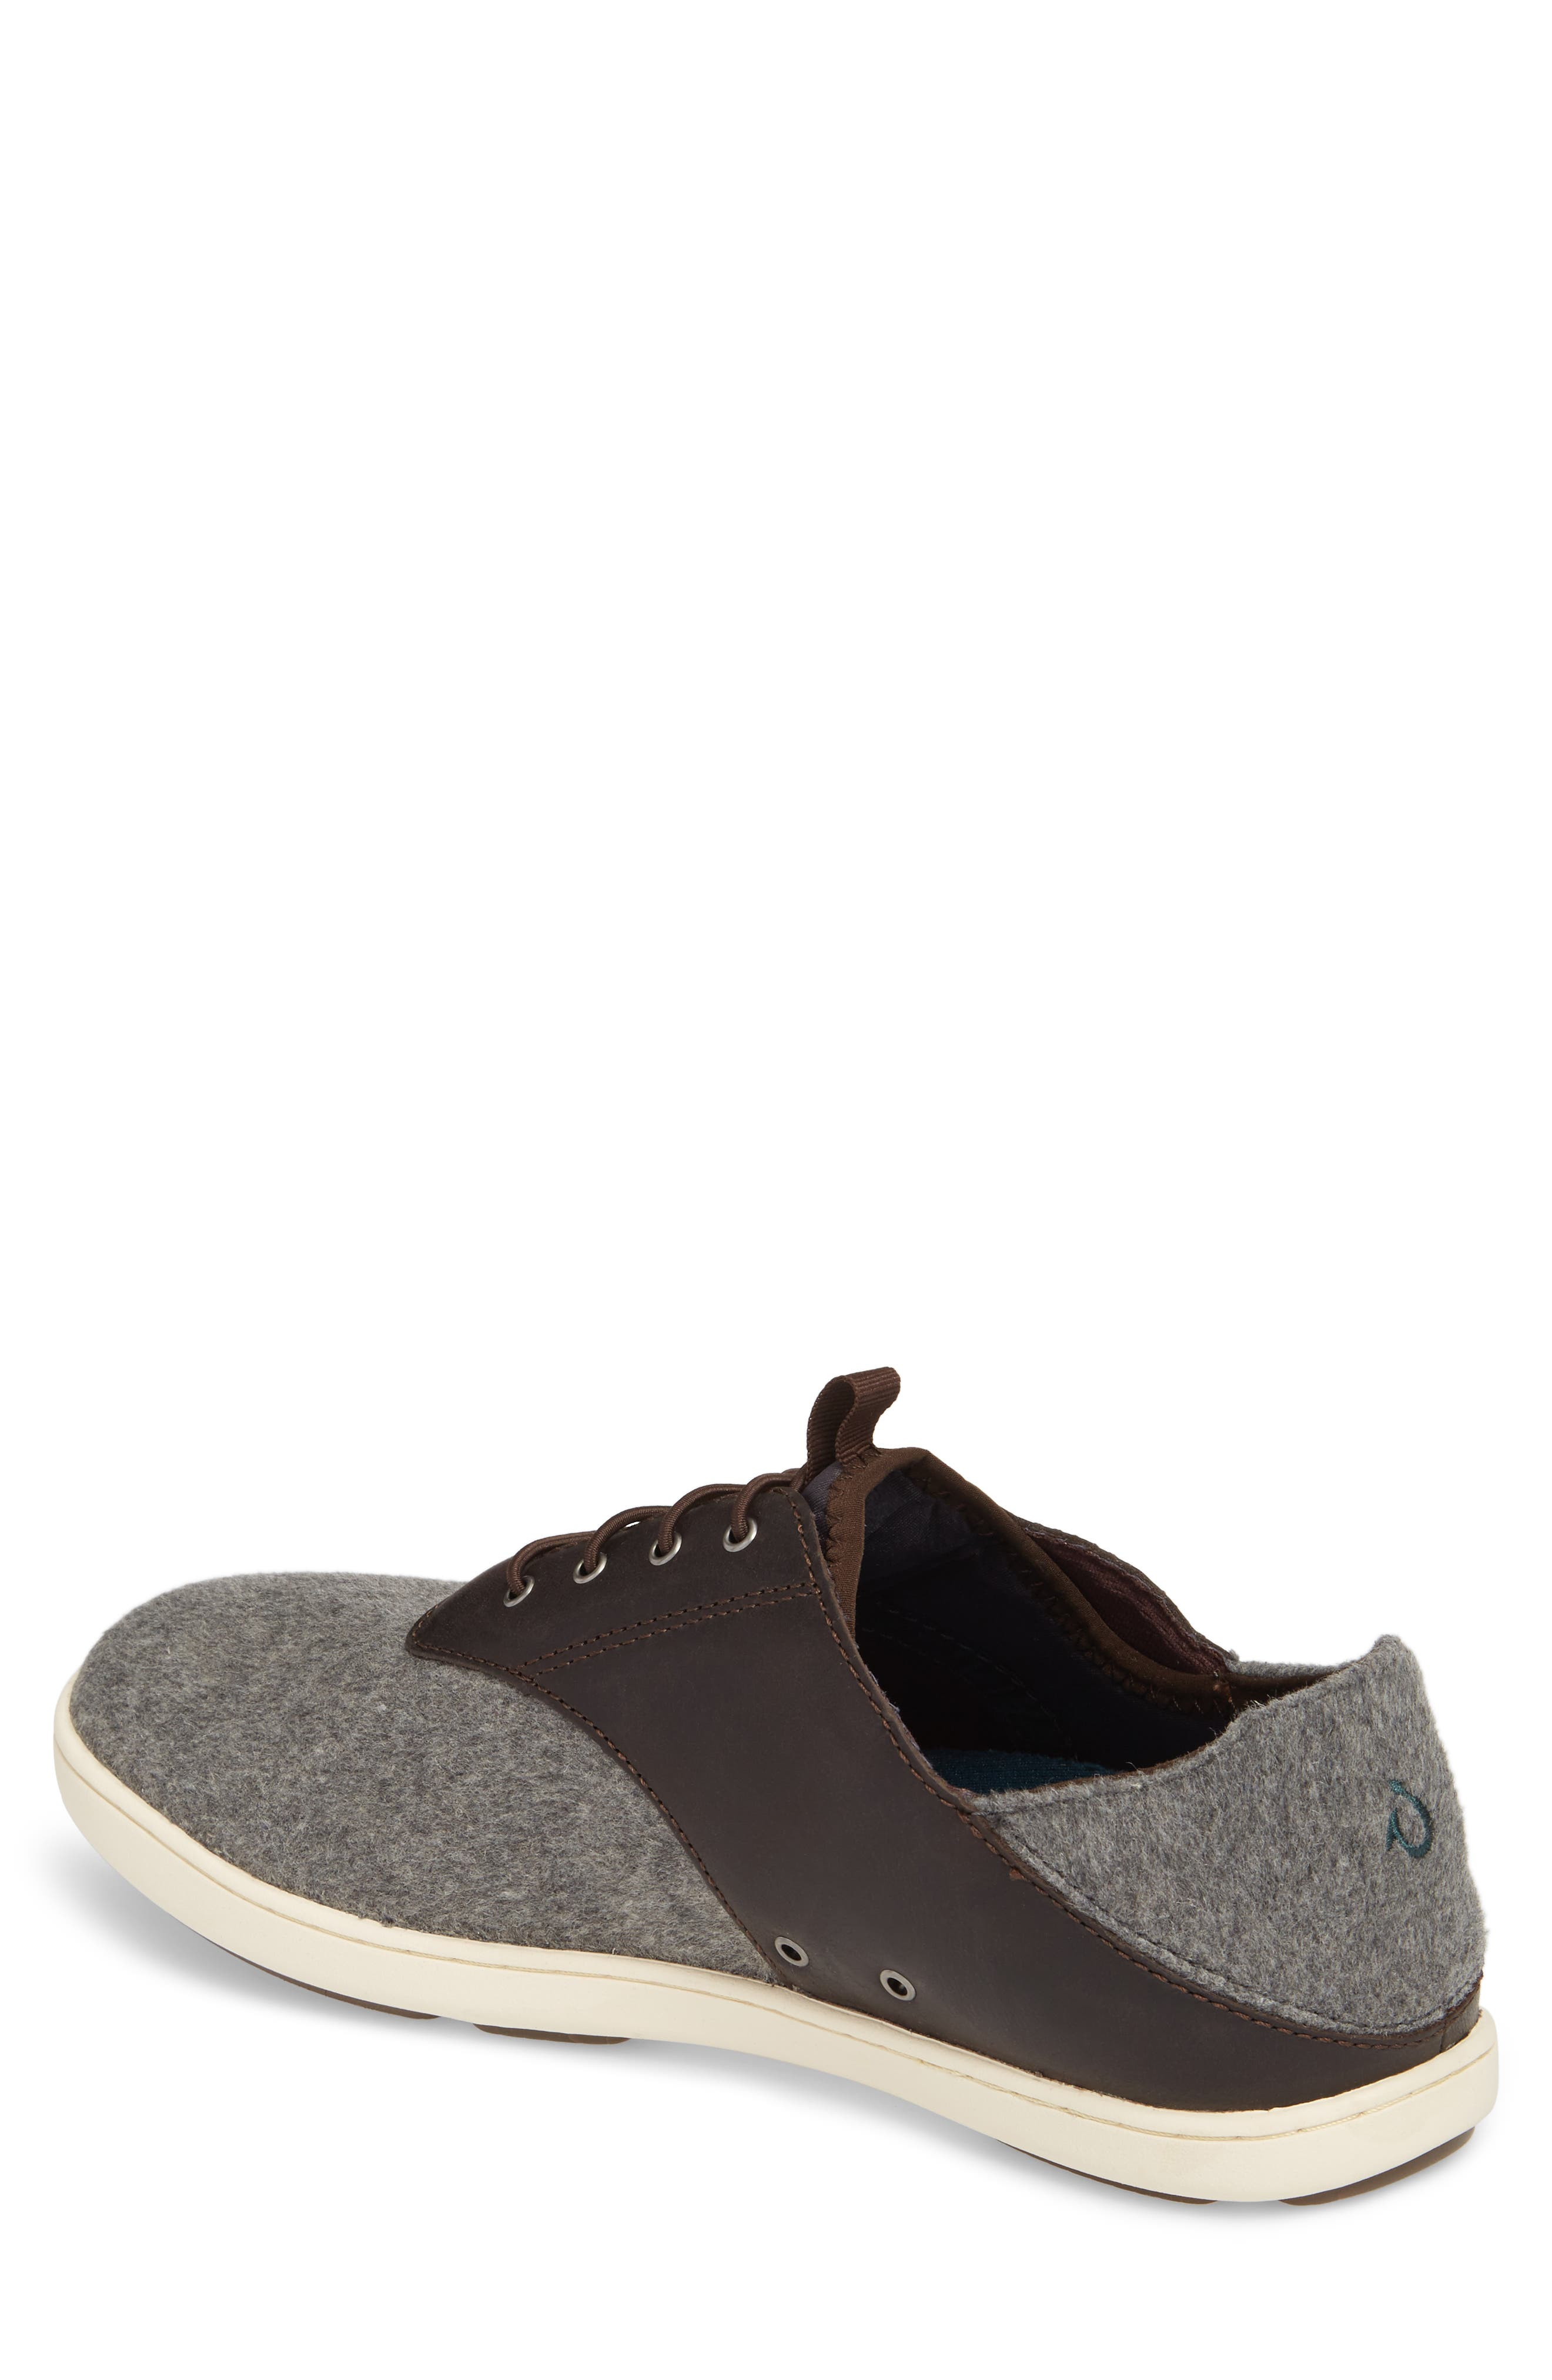 Alternate Image 2  - OluKai Nohea Moku Hulu Sneaker (Men)